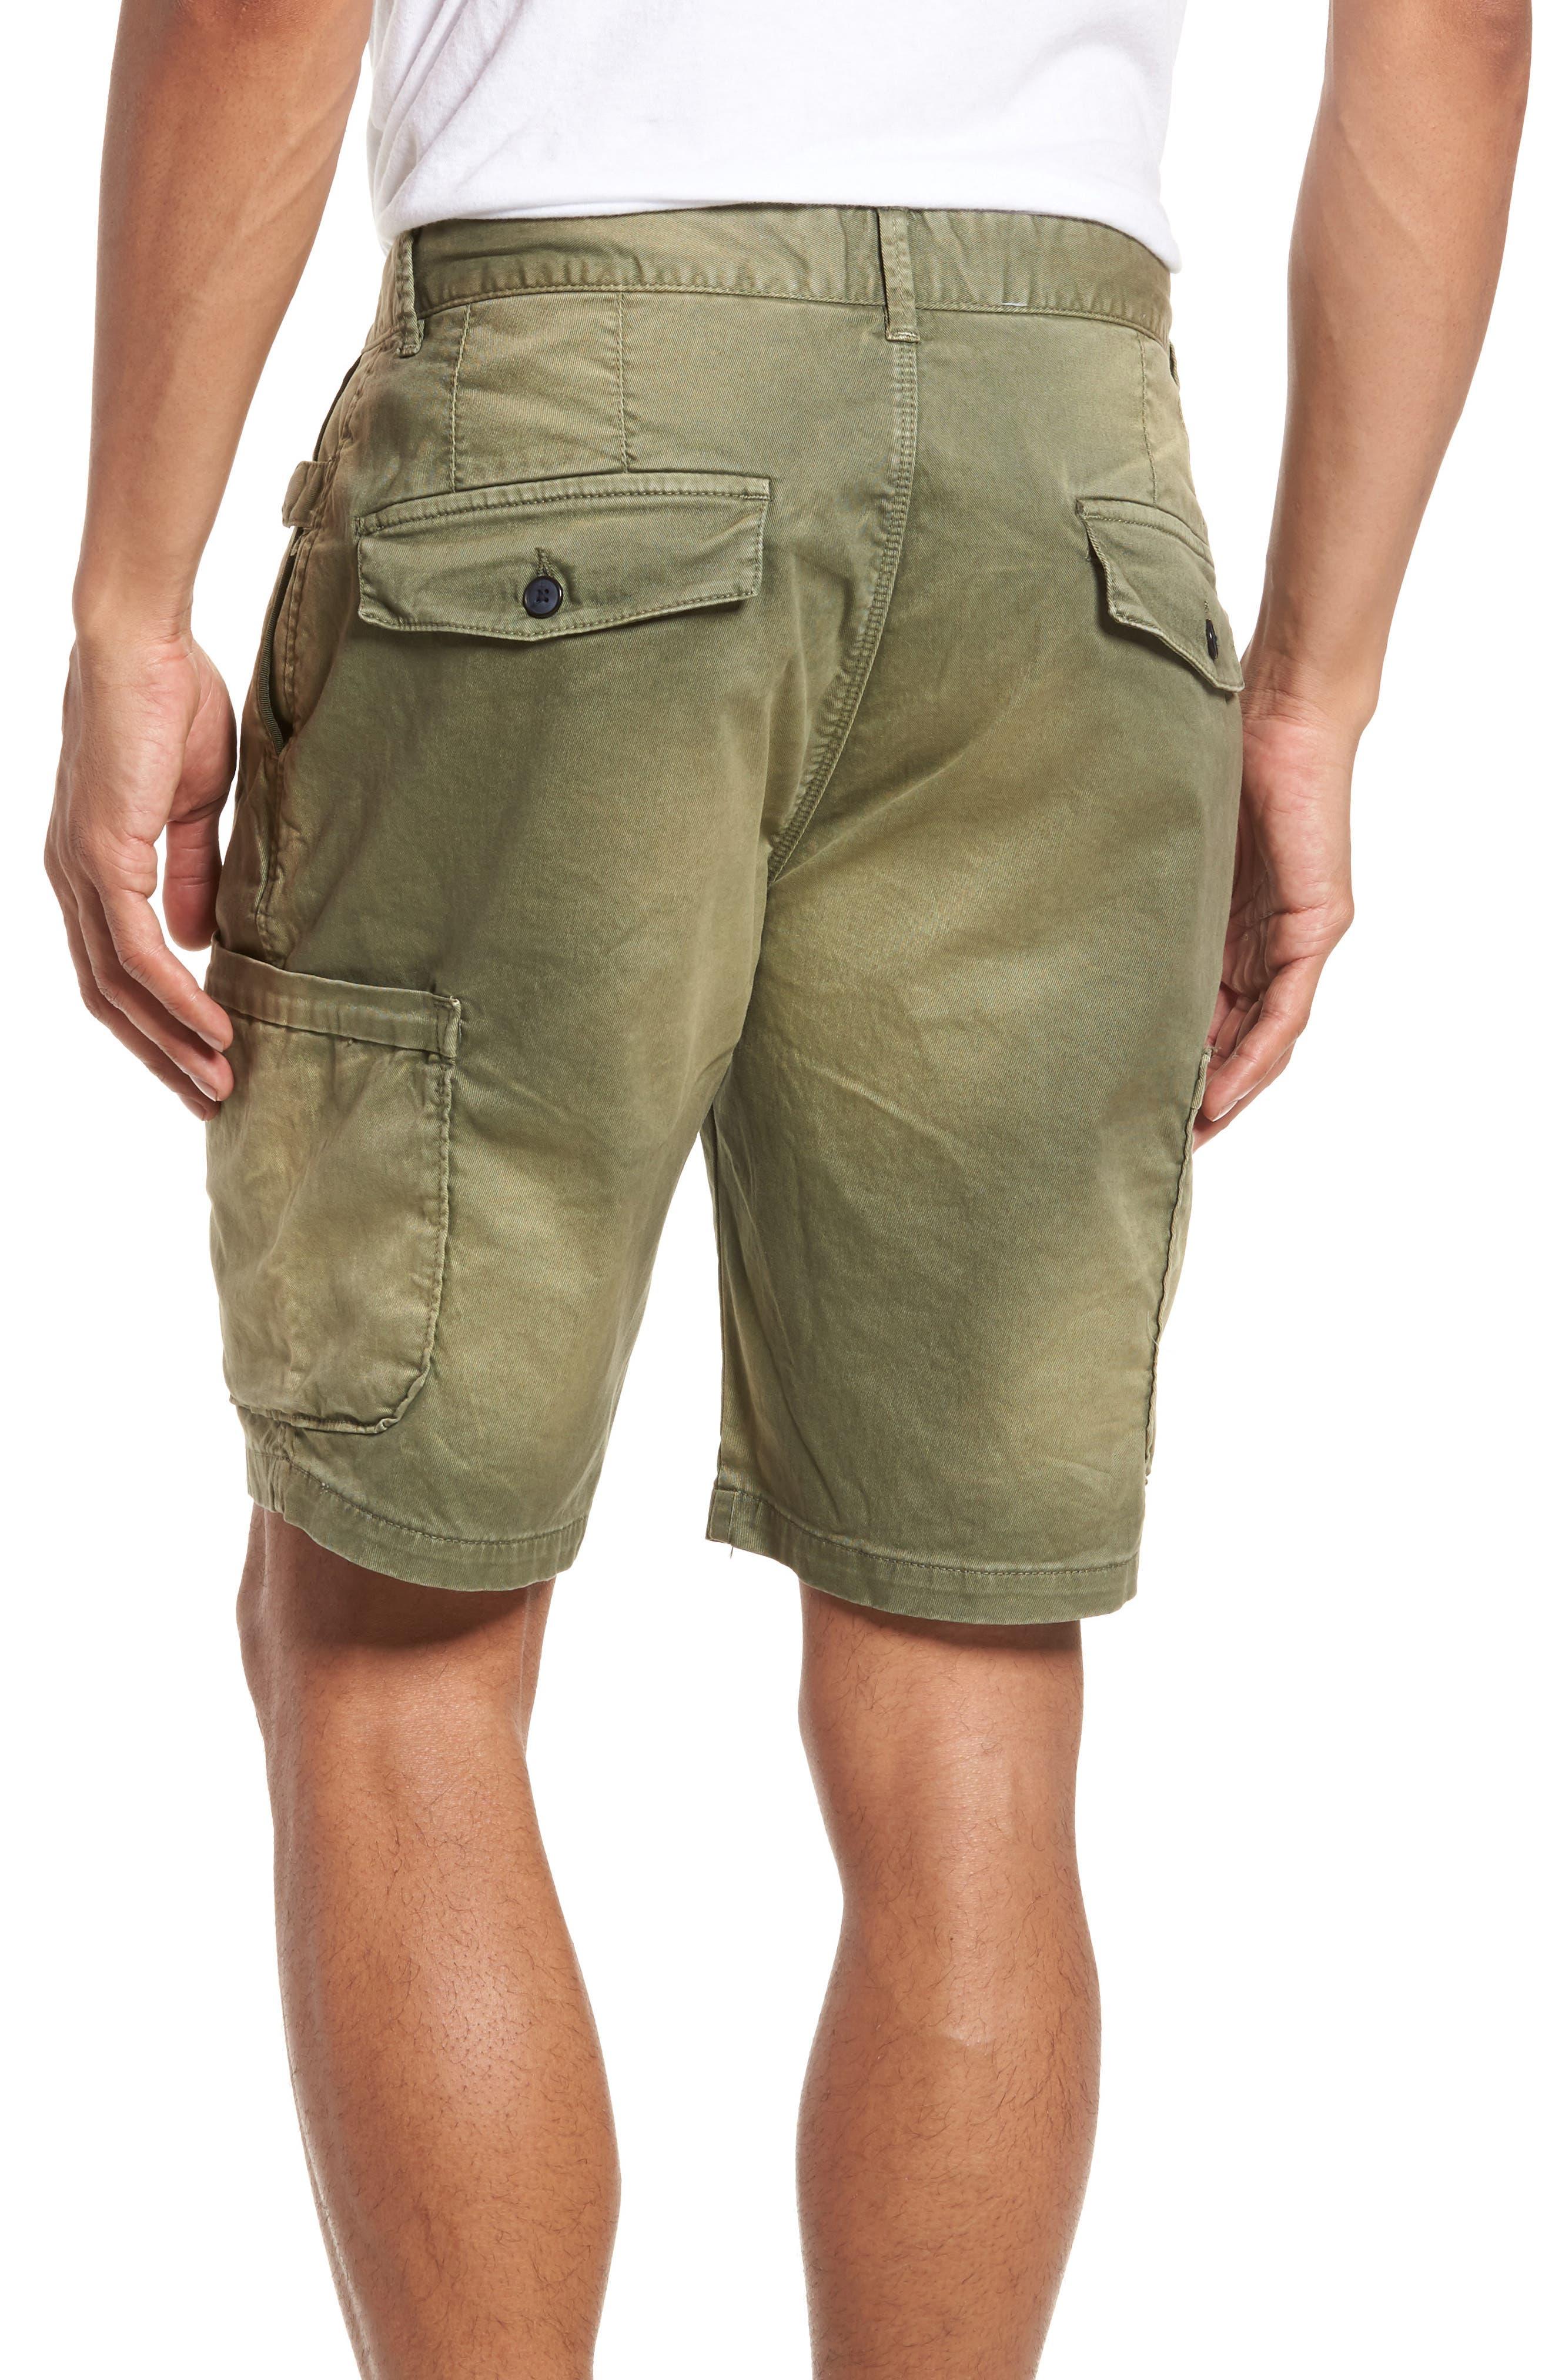 Washed Cargo Shorts,                             Alternate thumbnail 2, color,                             310